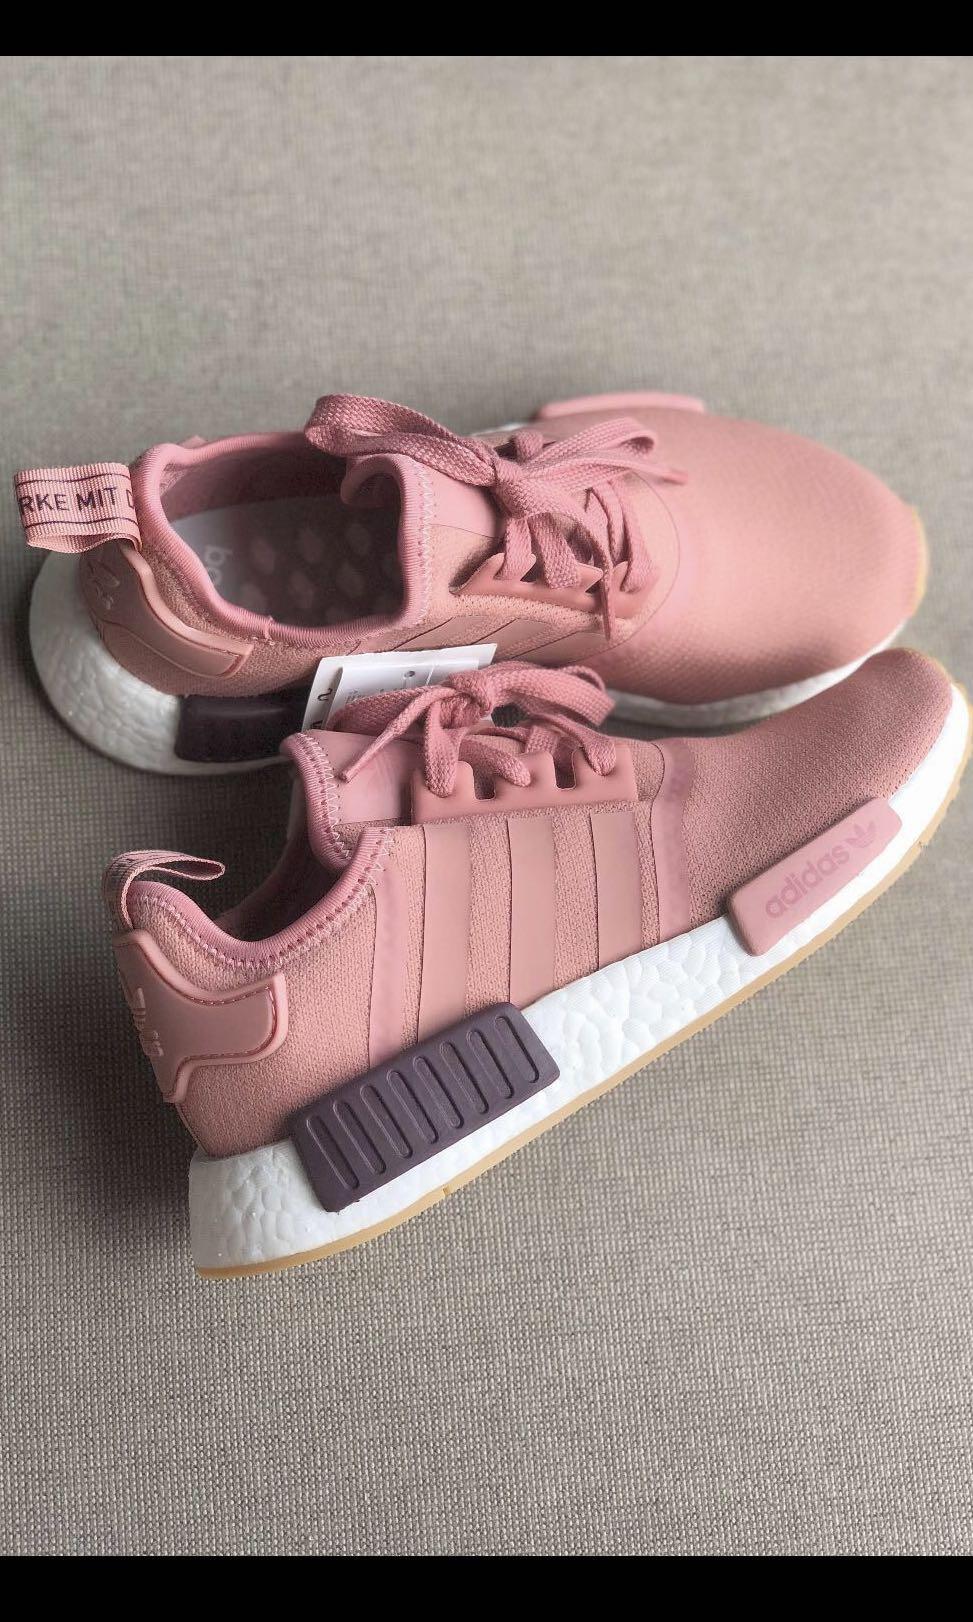 so cheap nmd r1 raw pink distrisneaks 0b7de 0109f - teknowar.com eb1e01f0b